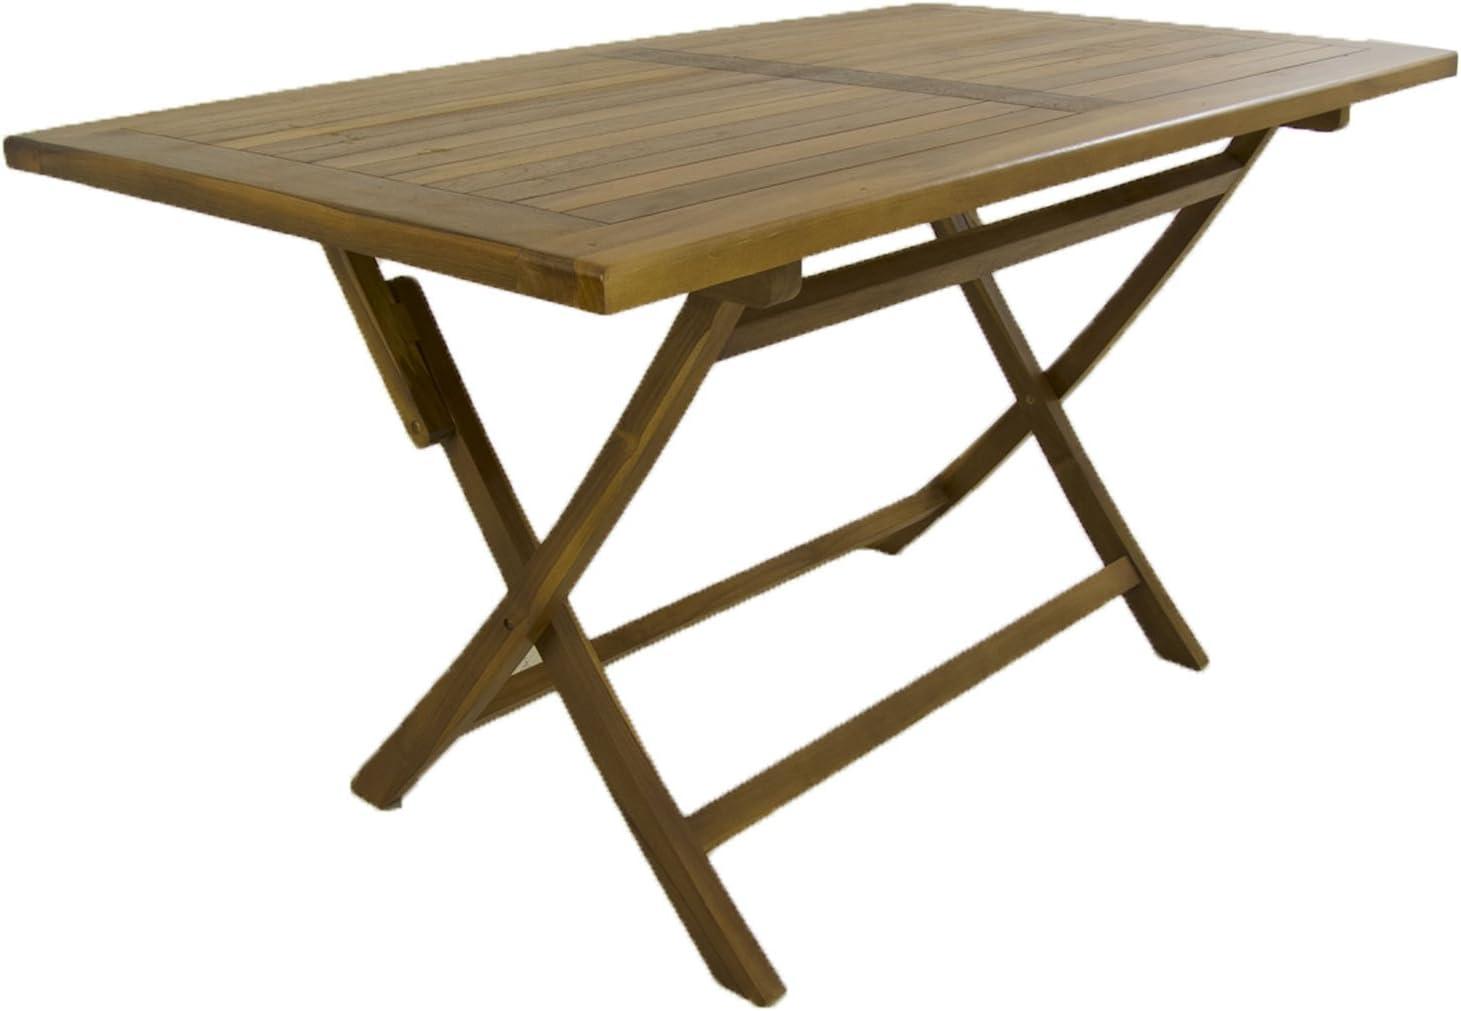 Mesa de jardín Teca Rectangular 120 cm | Madera Teca Grado A | Tamaño: 120x70x77 cm | Tratamiento al Agua aplicado | Portes Gratis